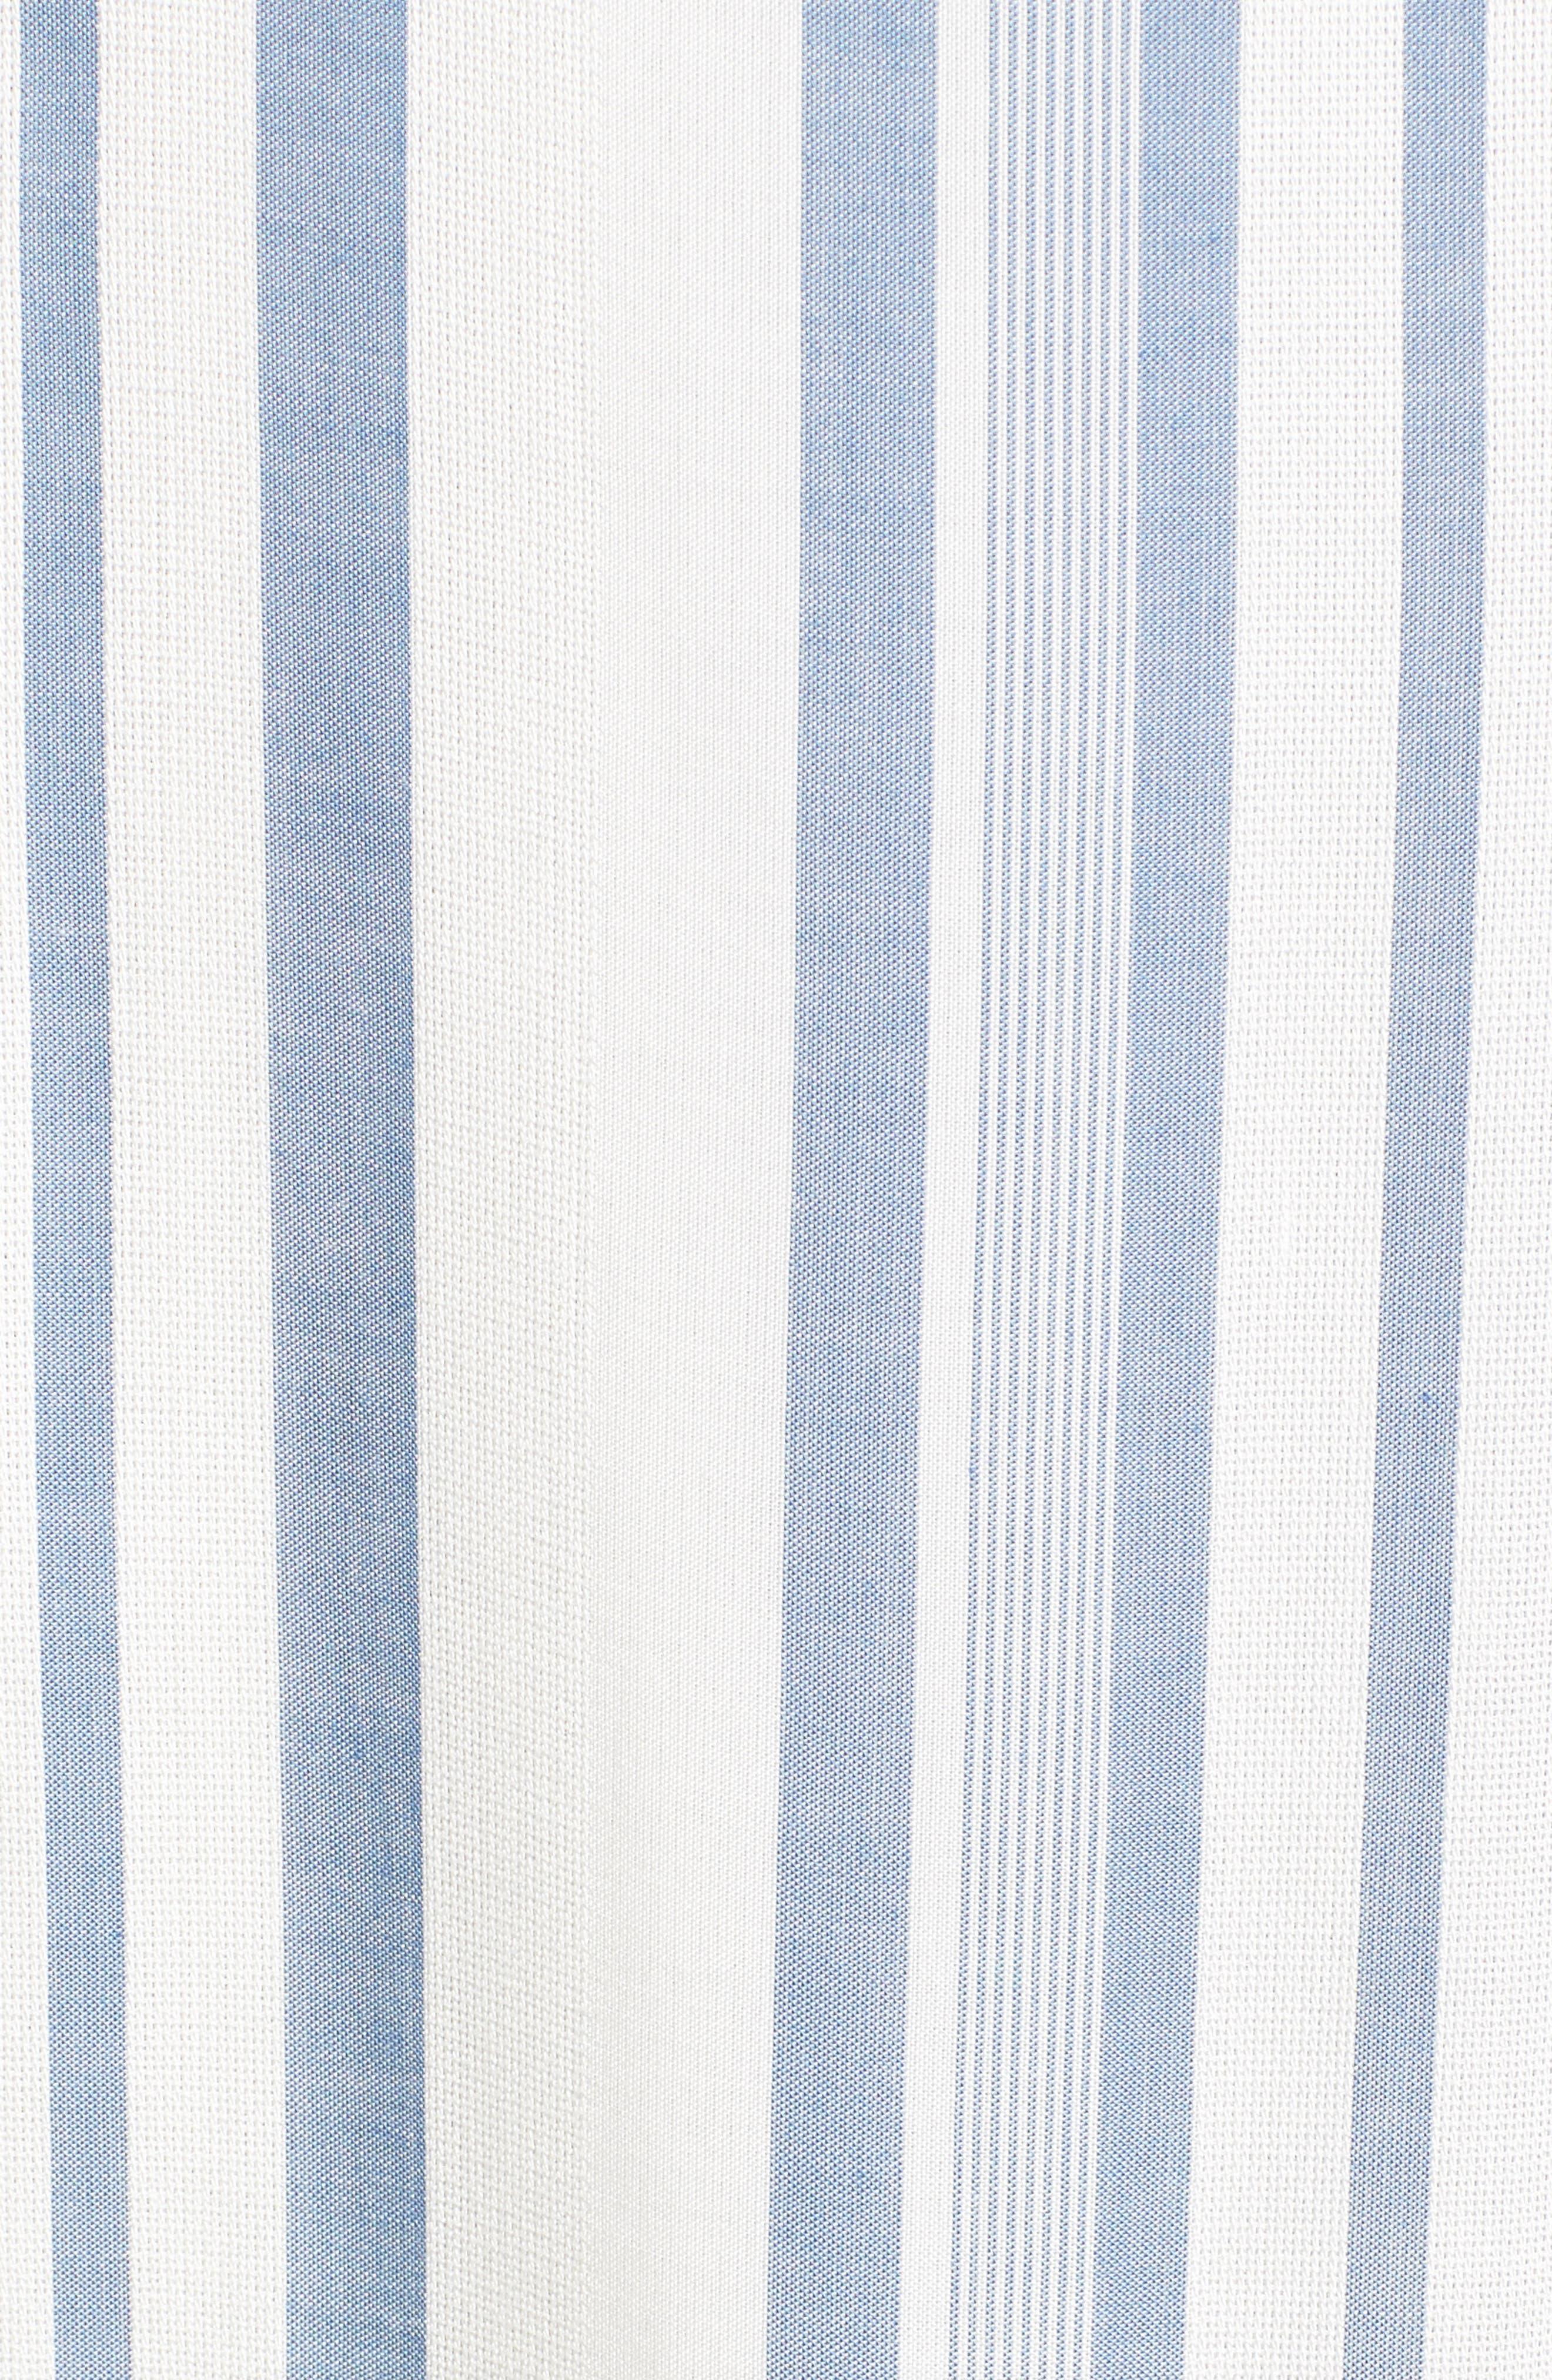 Bow Front Marina Maxi Dress,                             Alternate thumbnail 5, color,                             White/ Blue